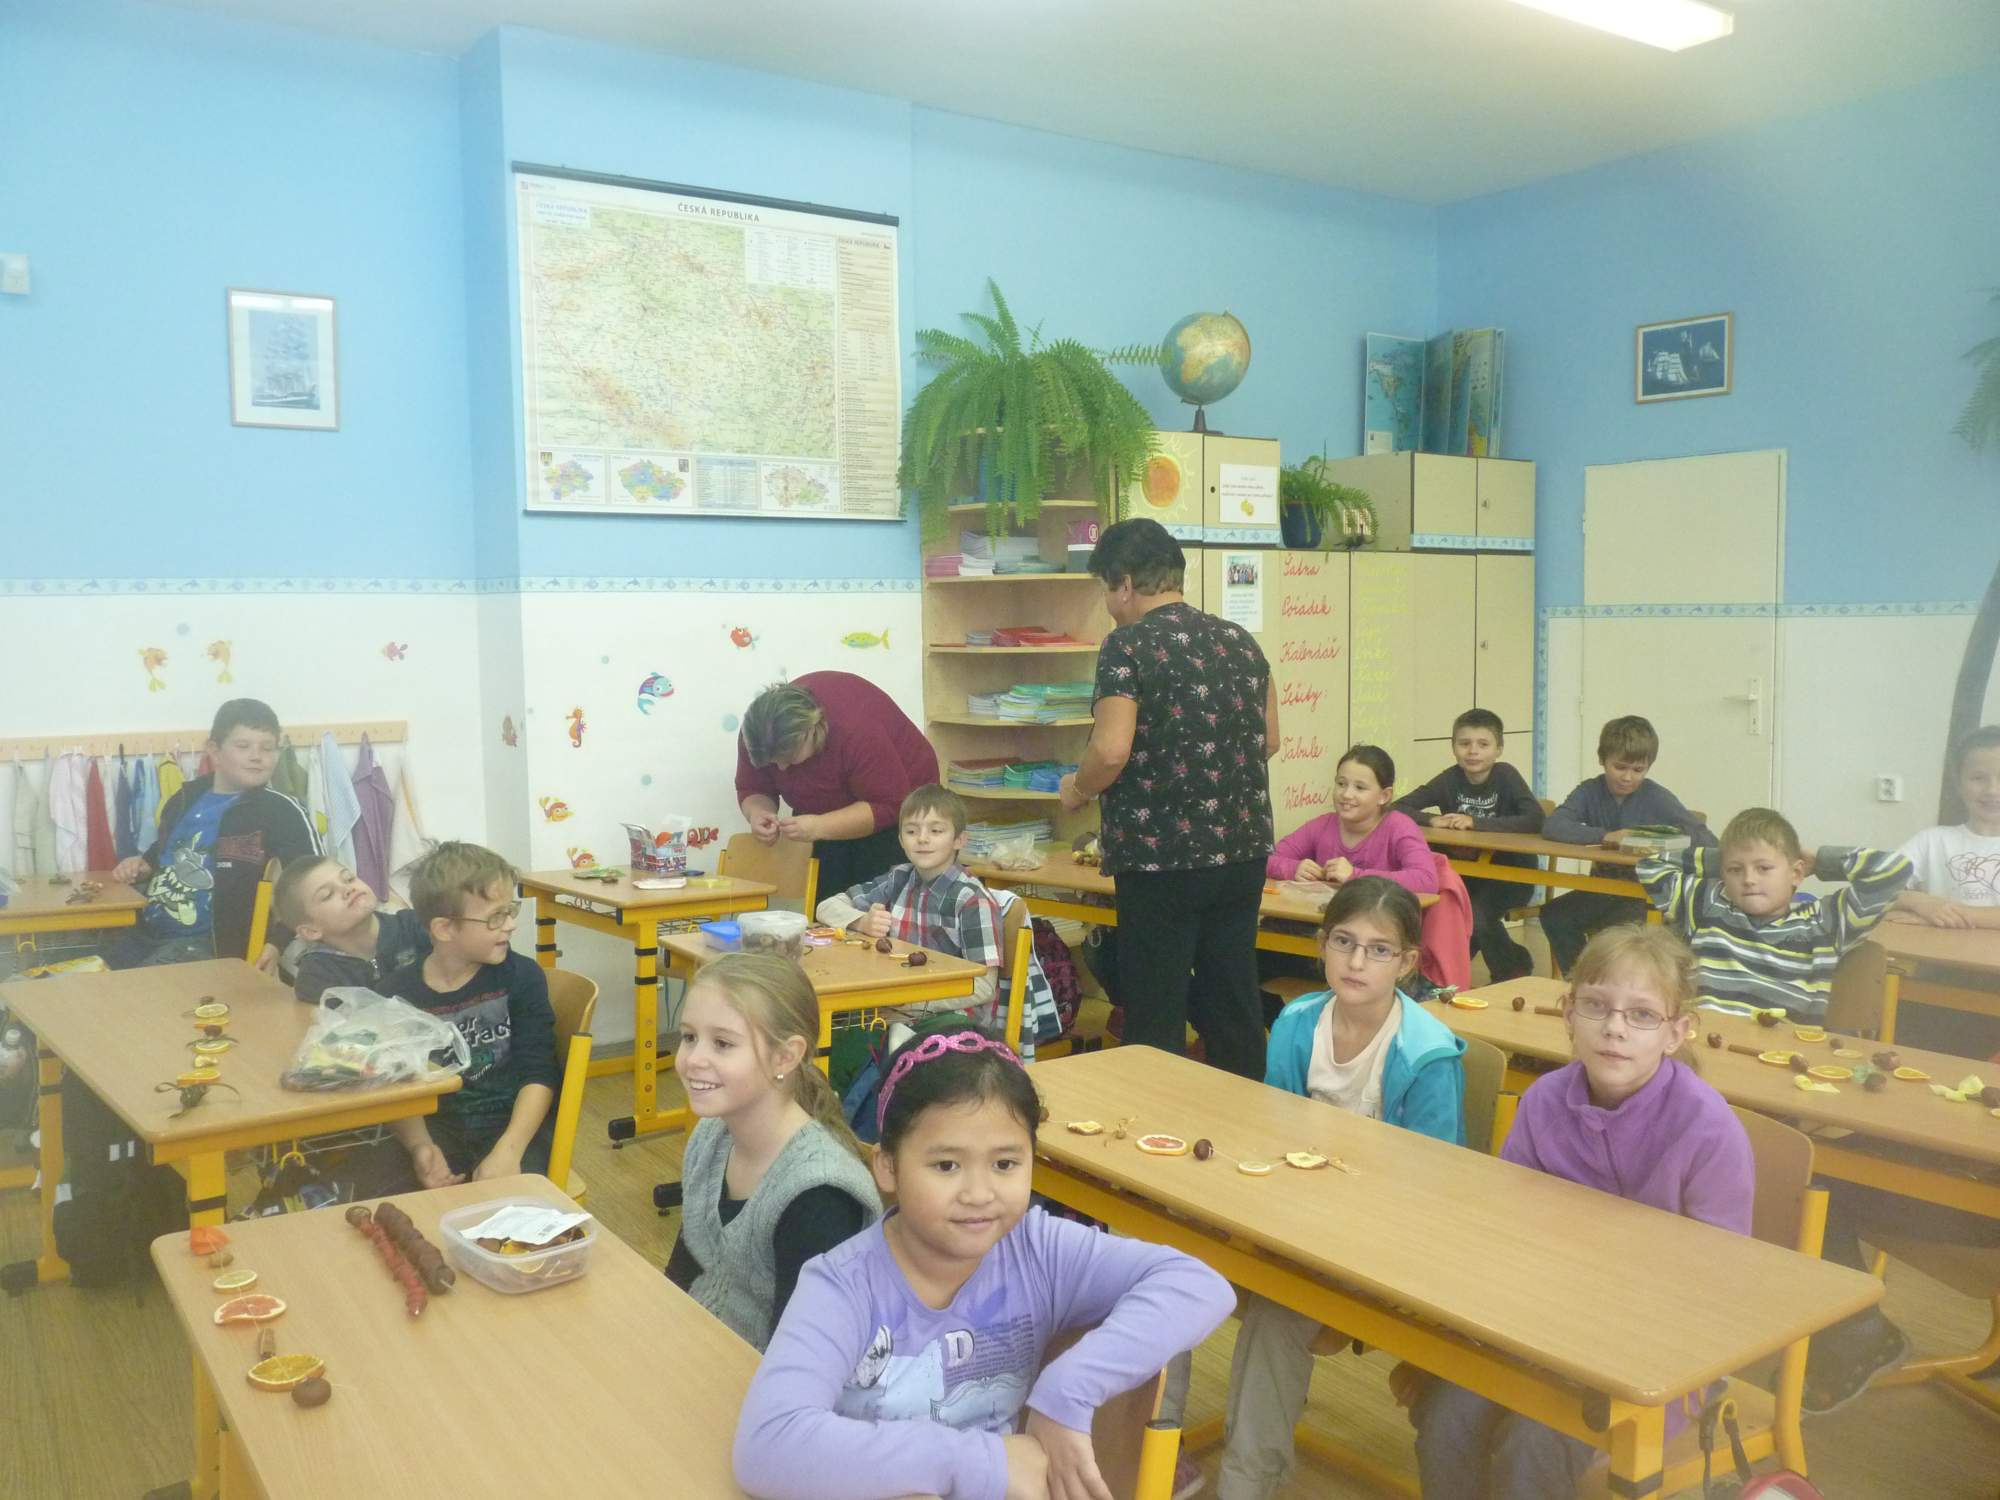 rajce.idnes.cz girl child2